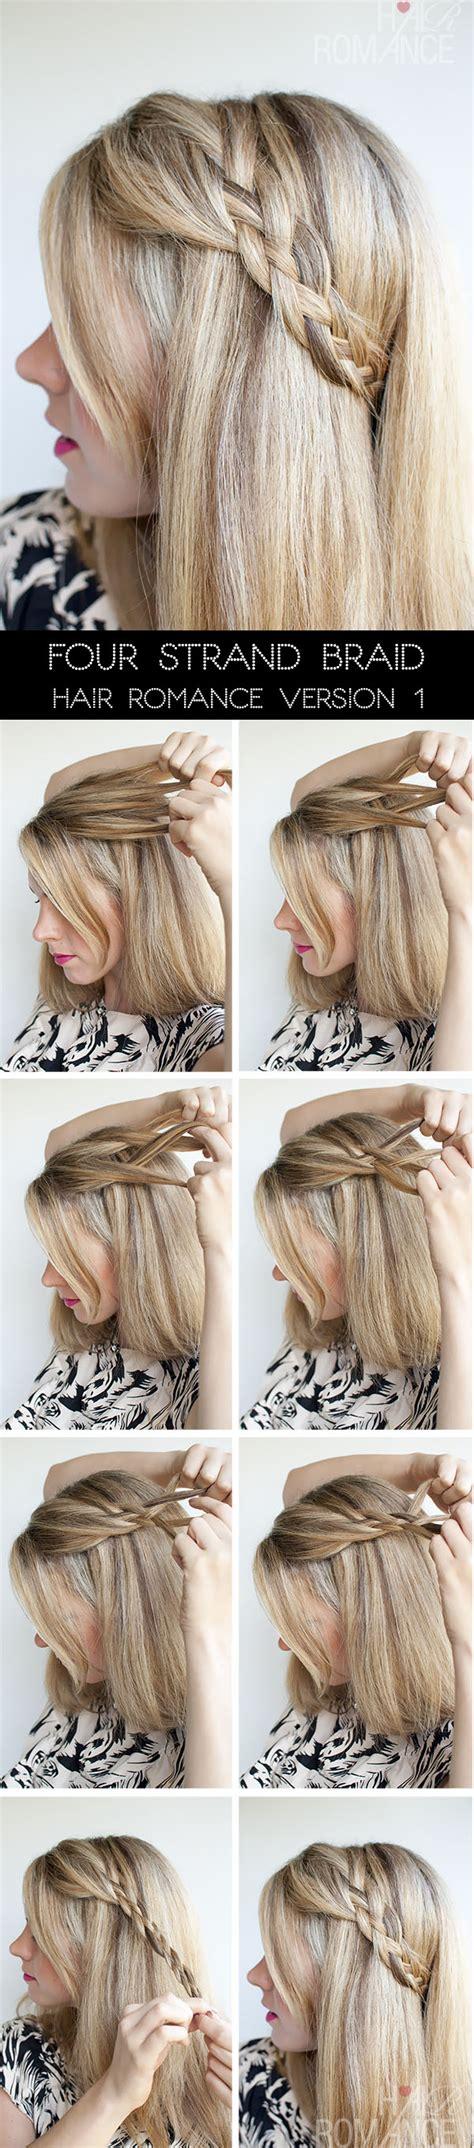 step by step braid hair hair tutorials 15 simple easy hairstyles you should not